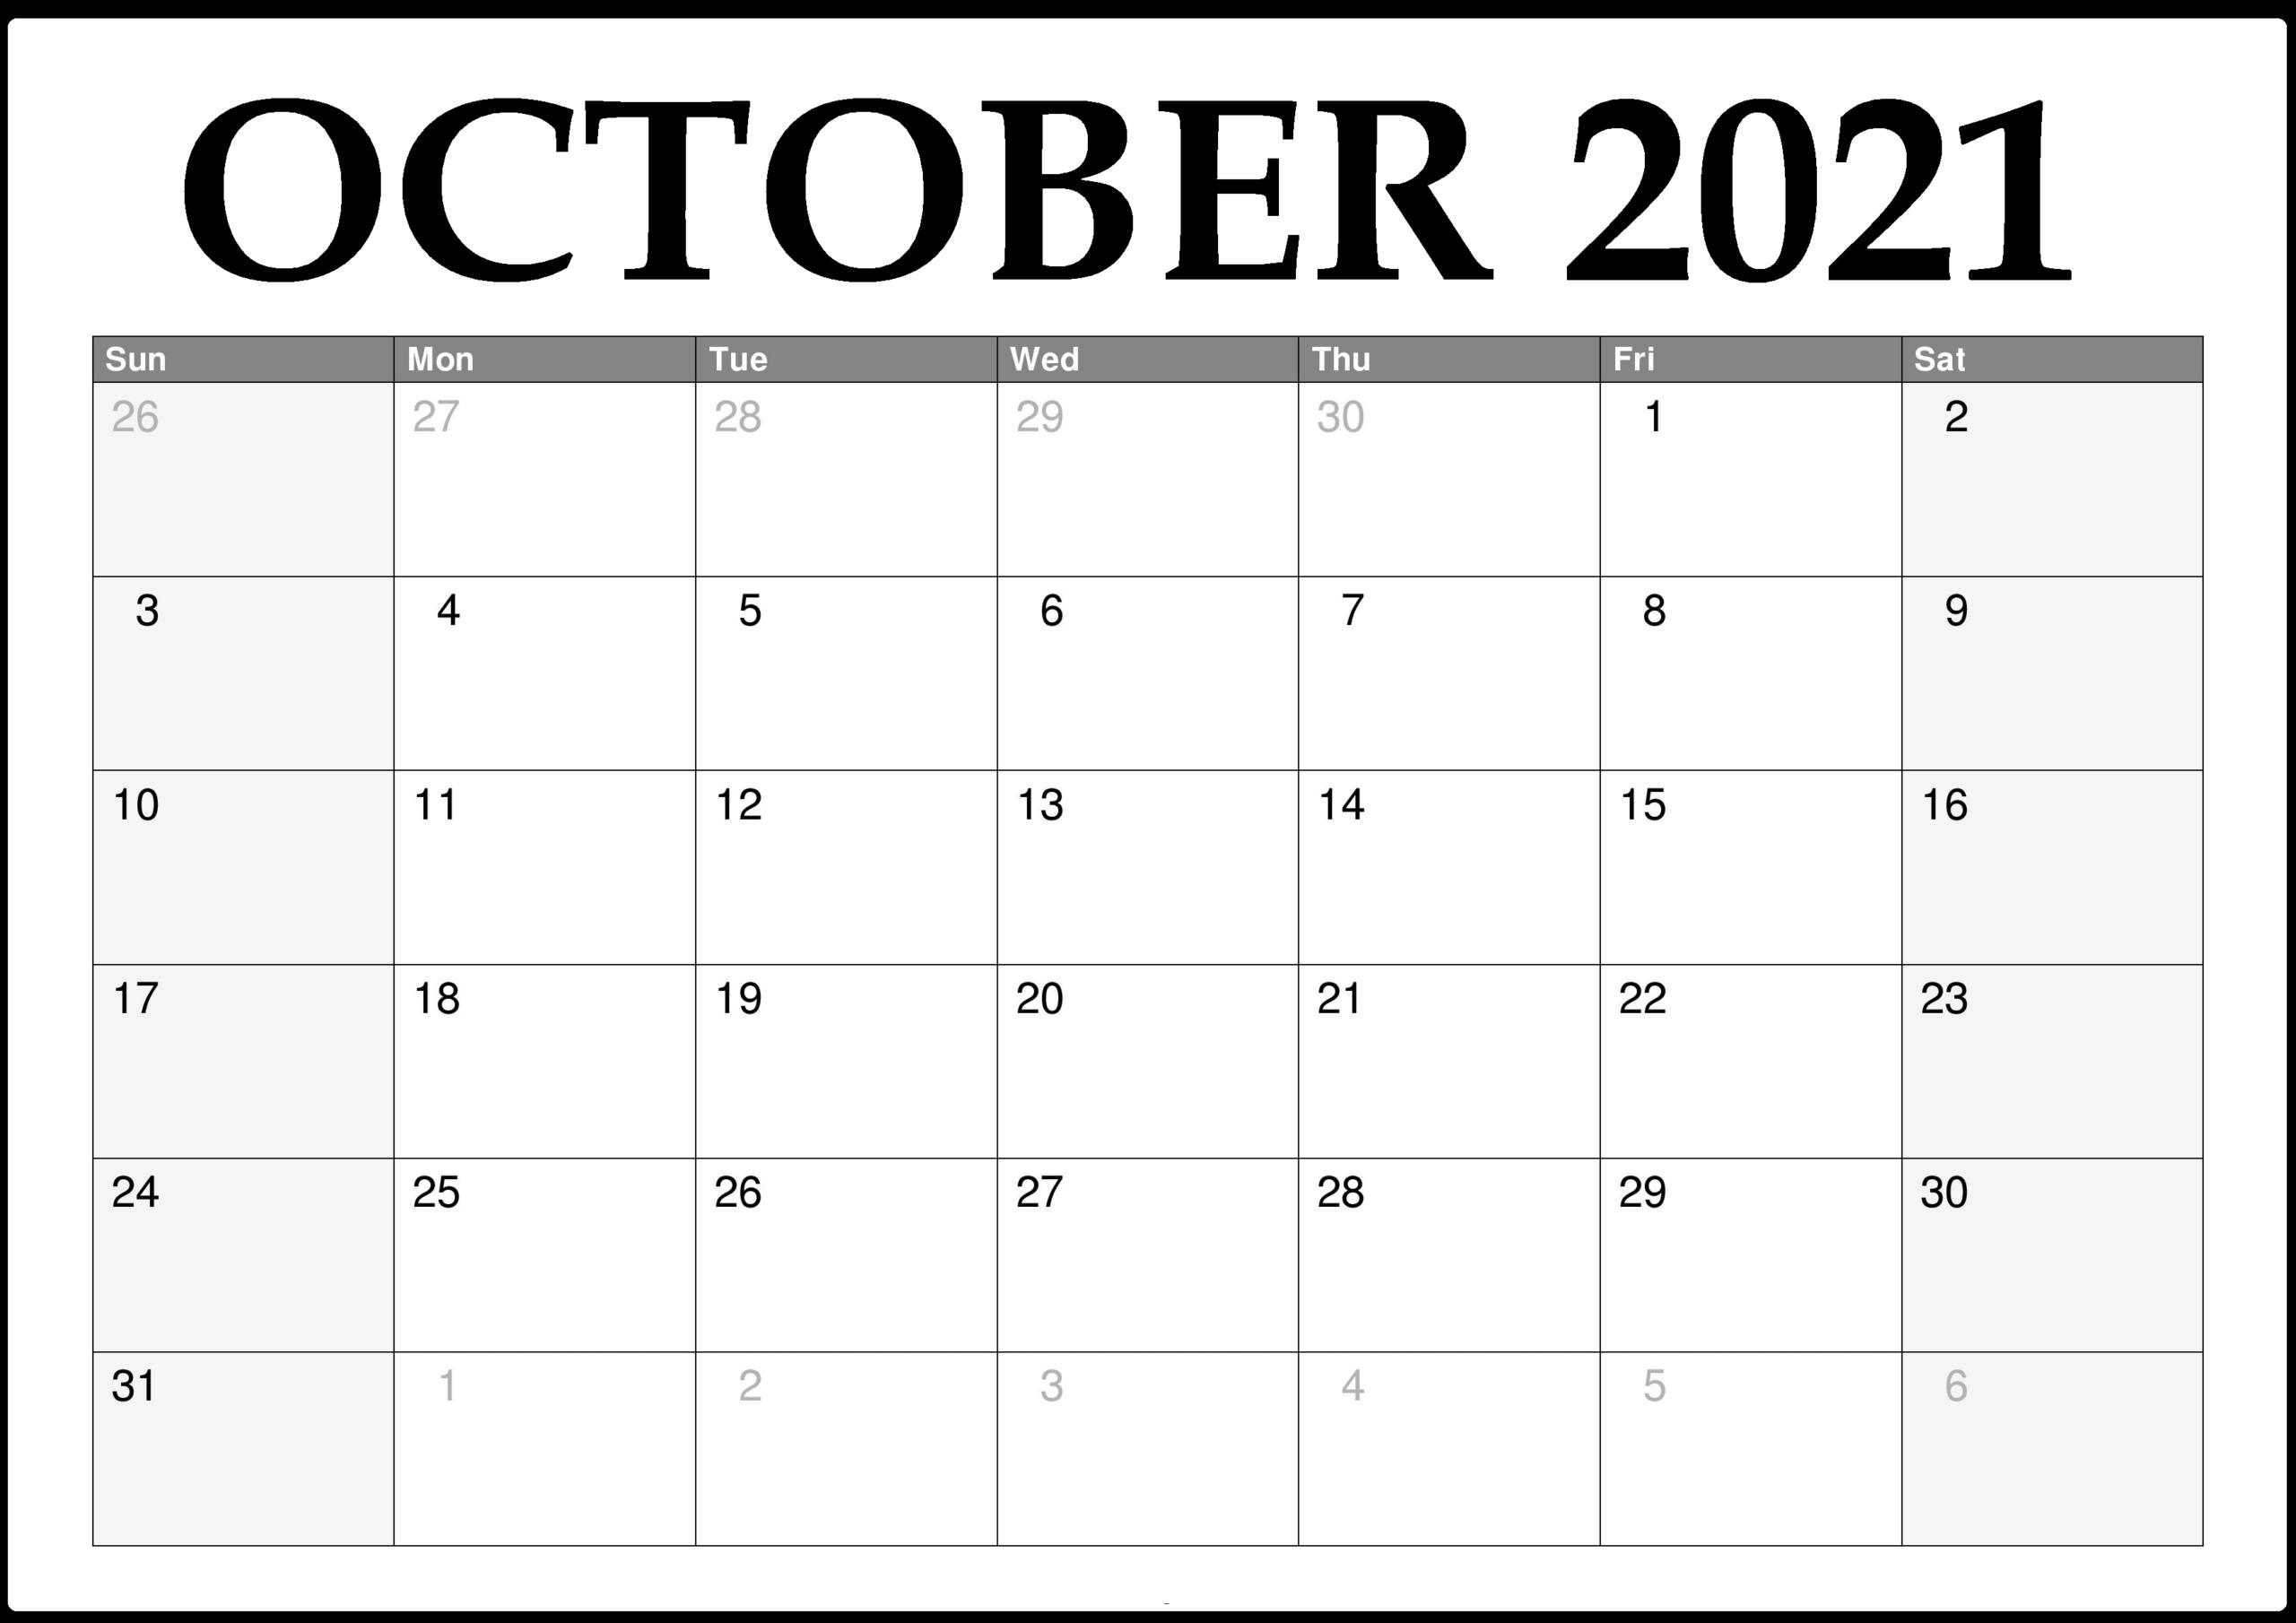 October 2021 Calendar Printable Template – Pdf, Word, Excel